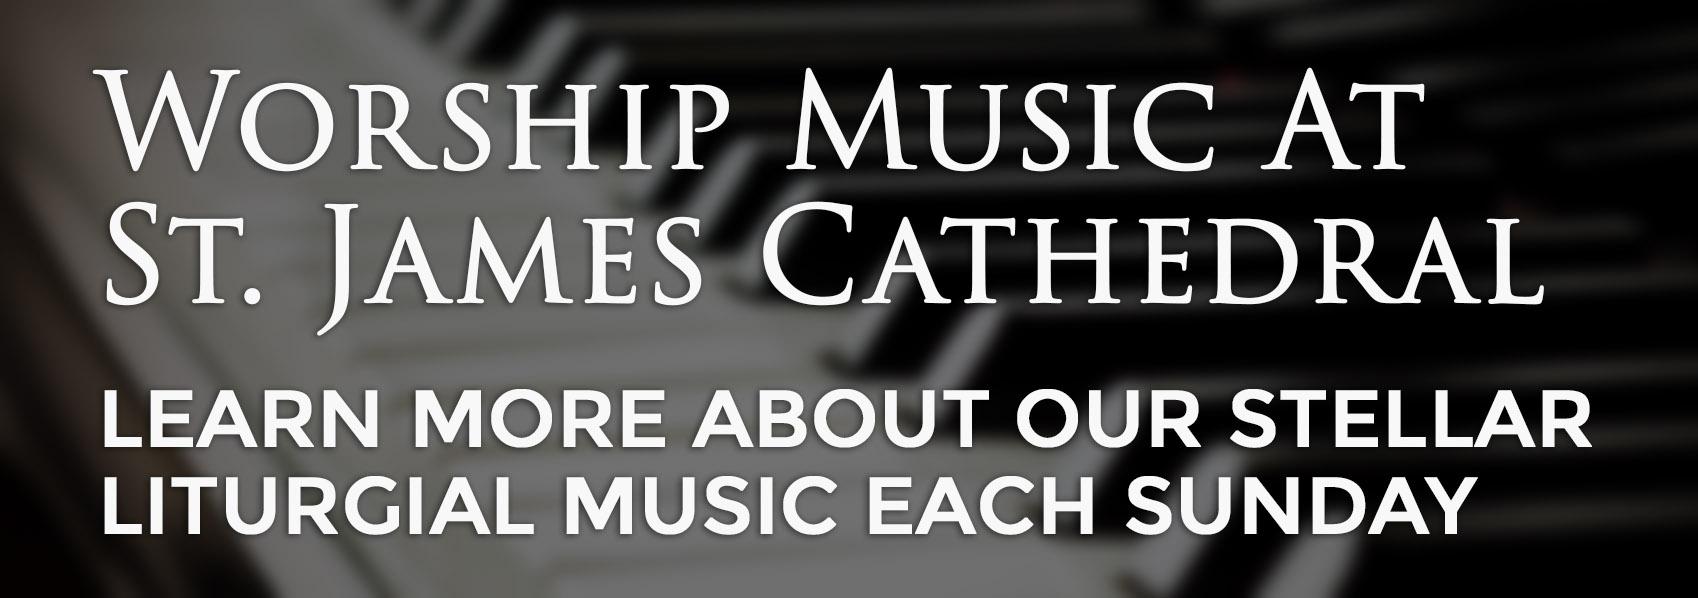 Worship Music at St James Cathedral